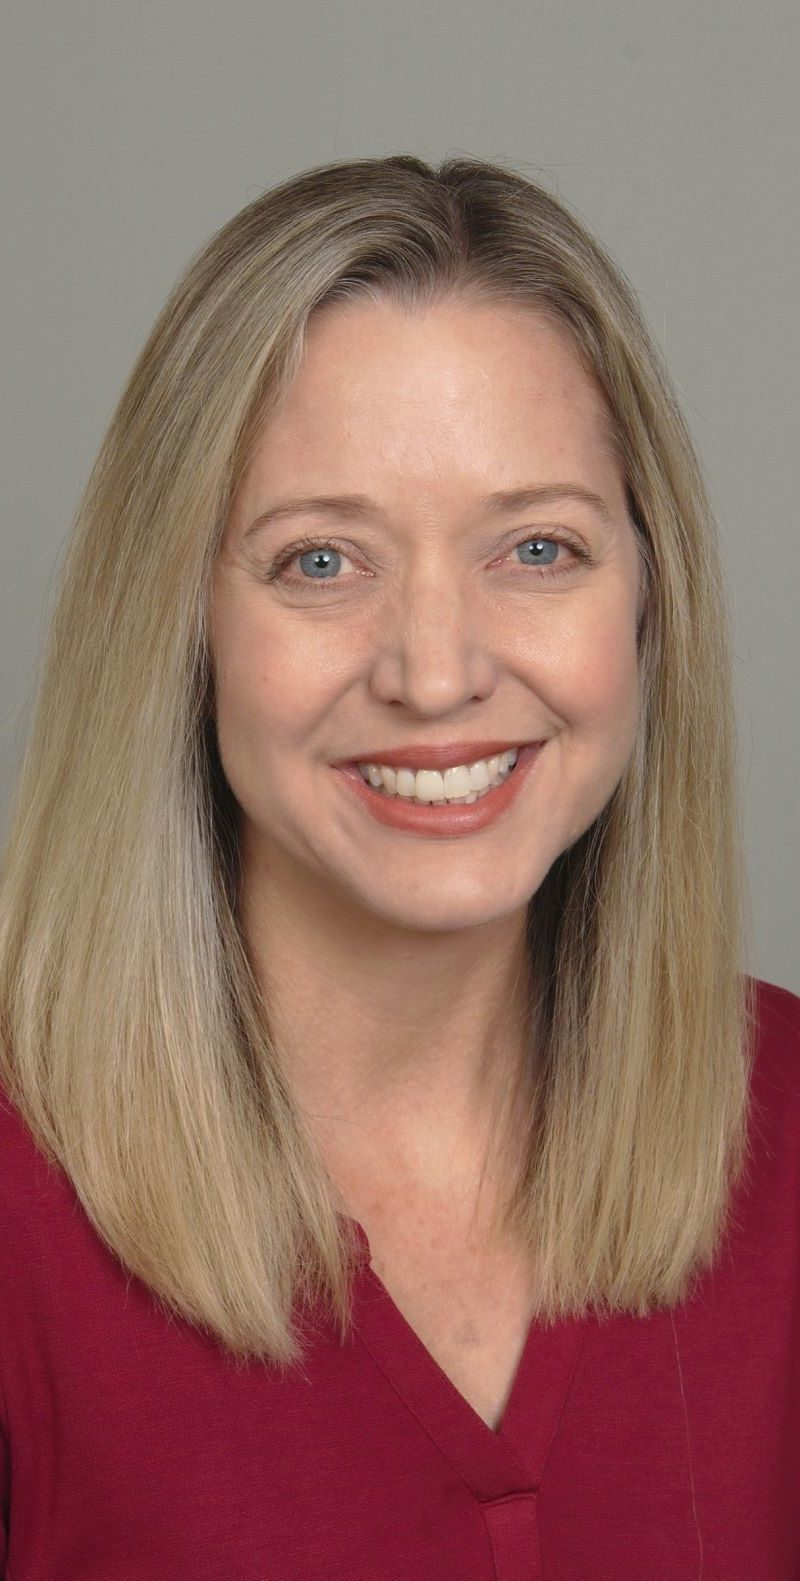 Anne C. Dobmeyer, PhD, ABPP